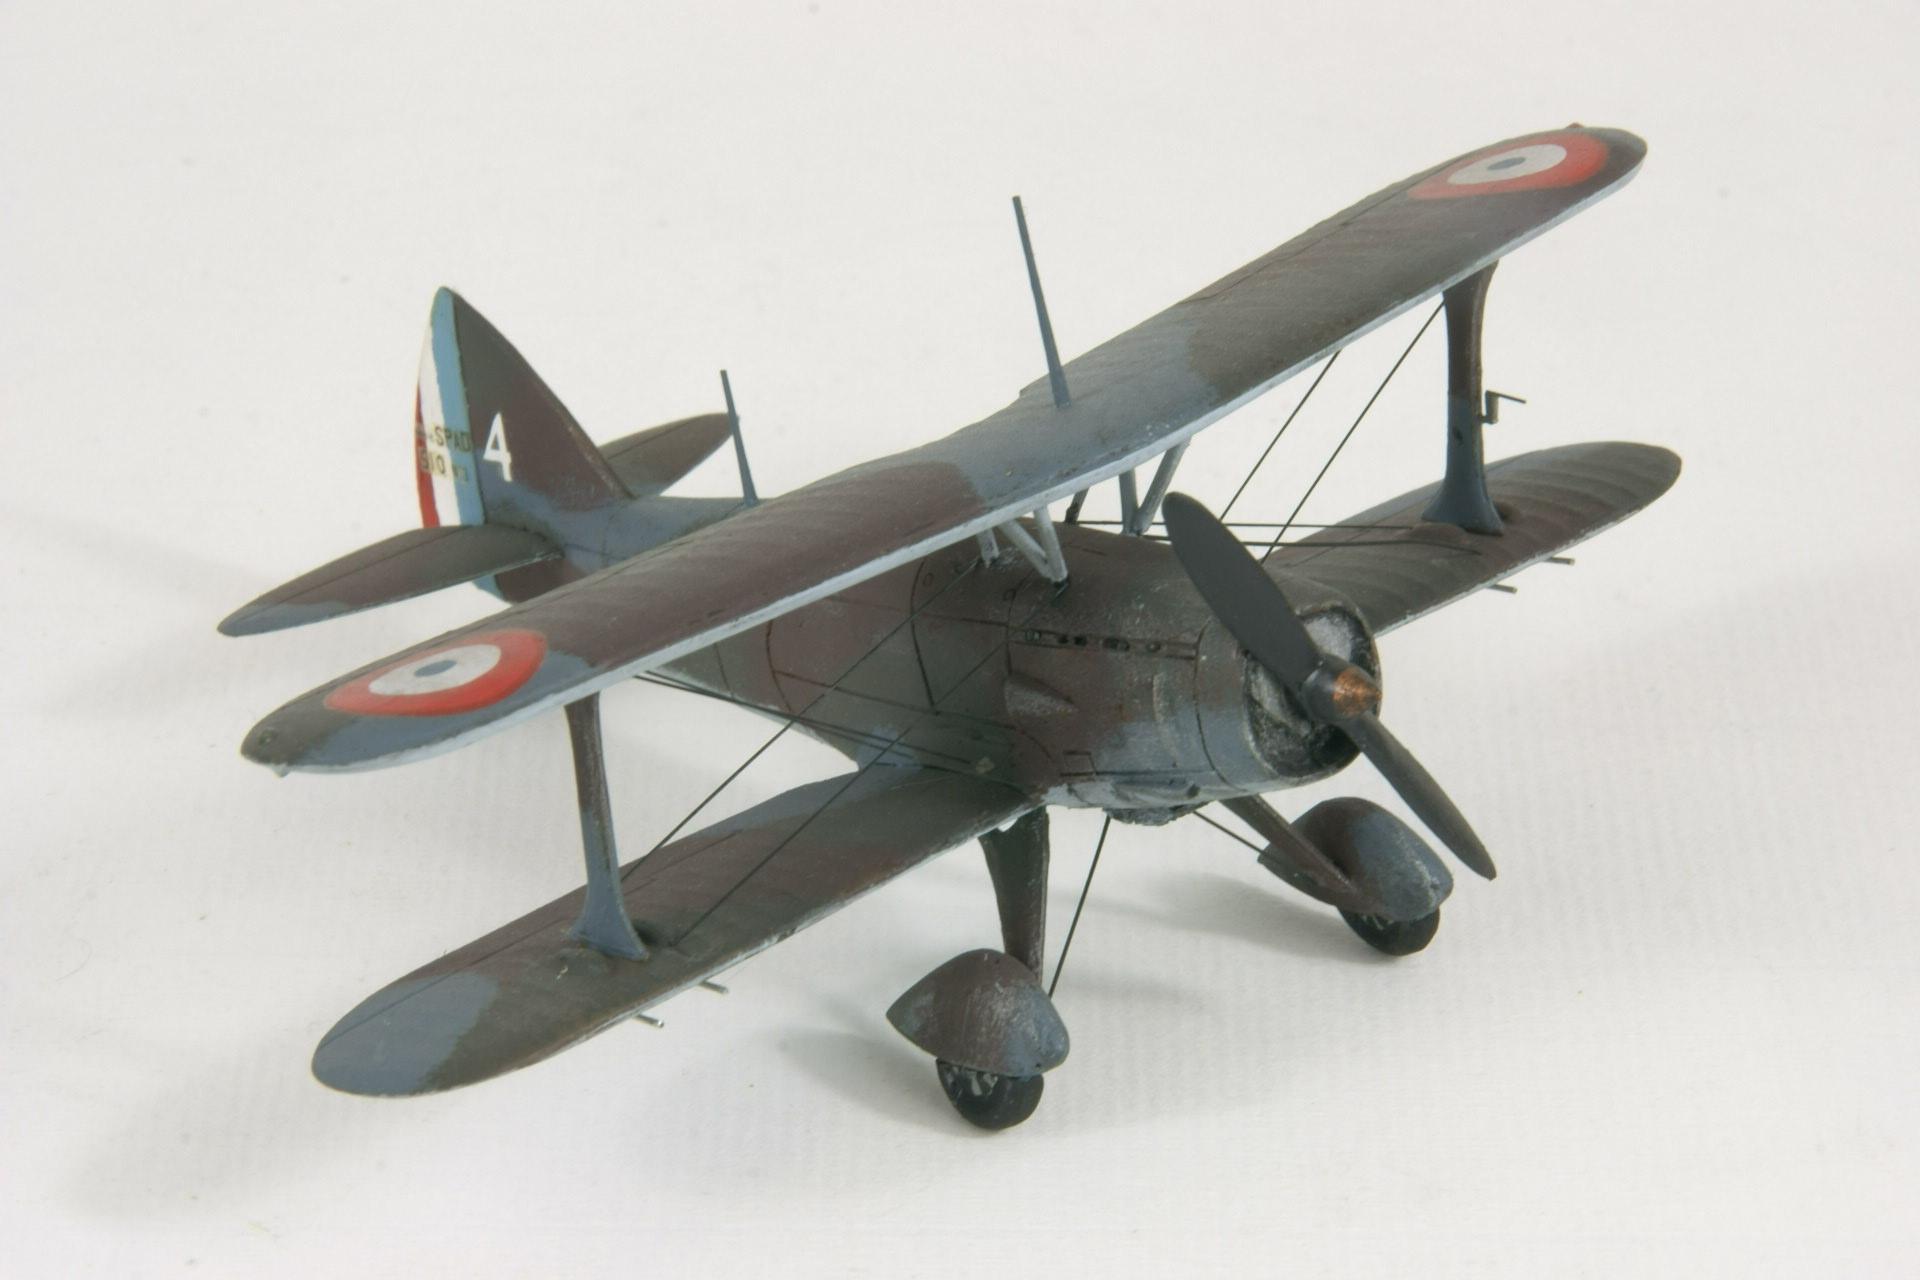 Bleriot spad 510 4 2